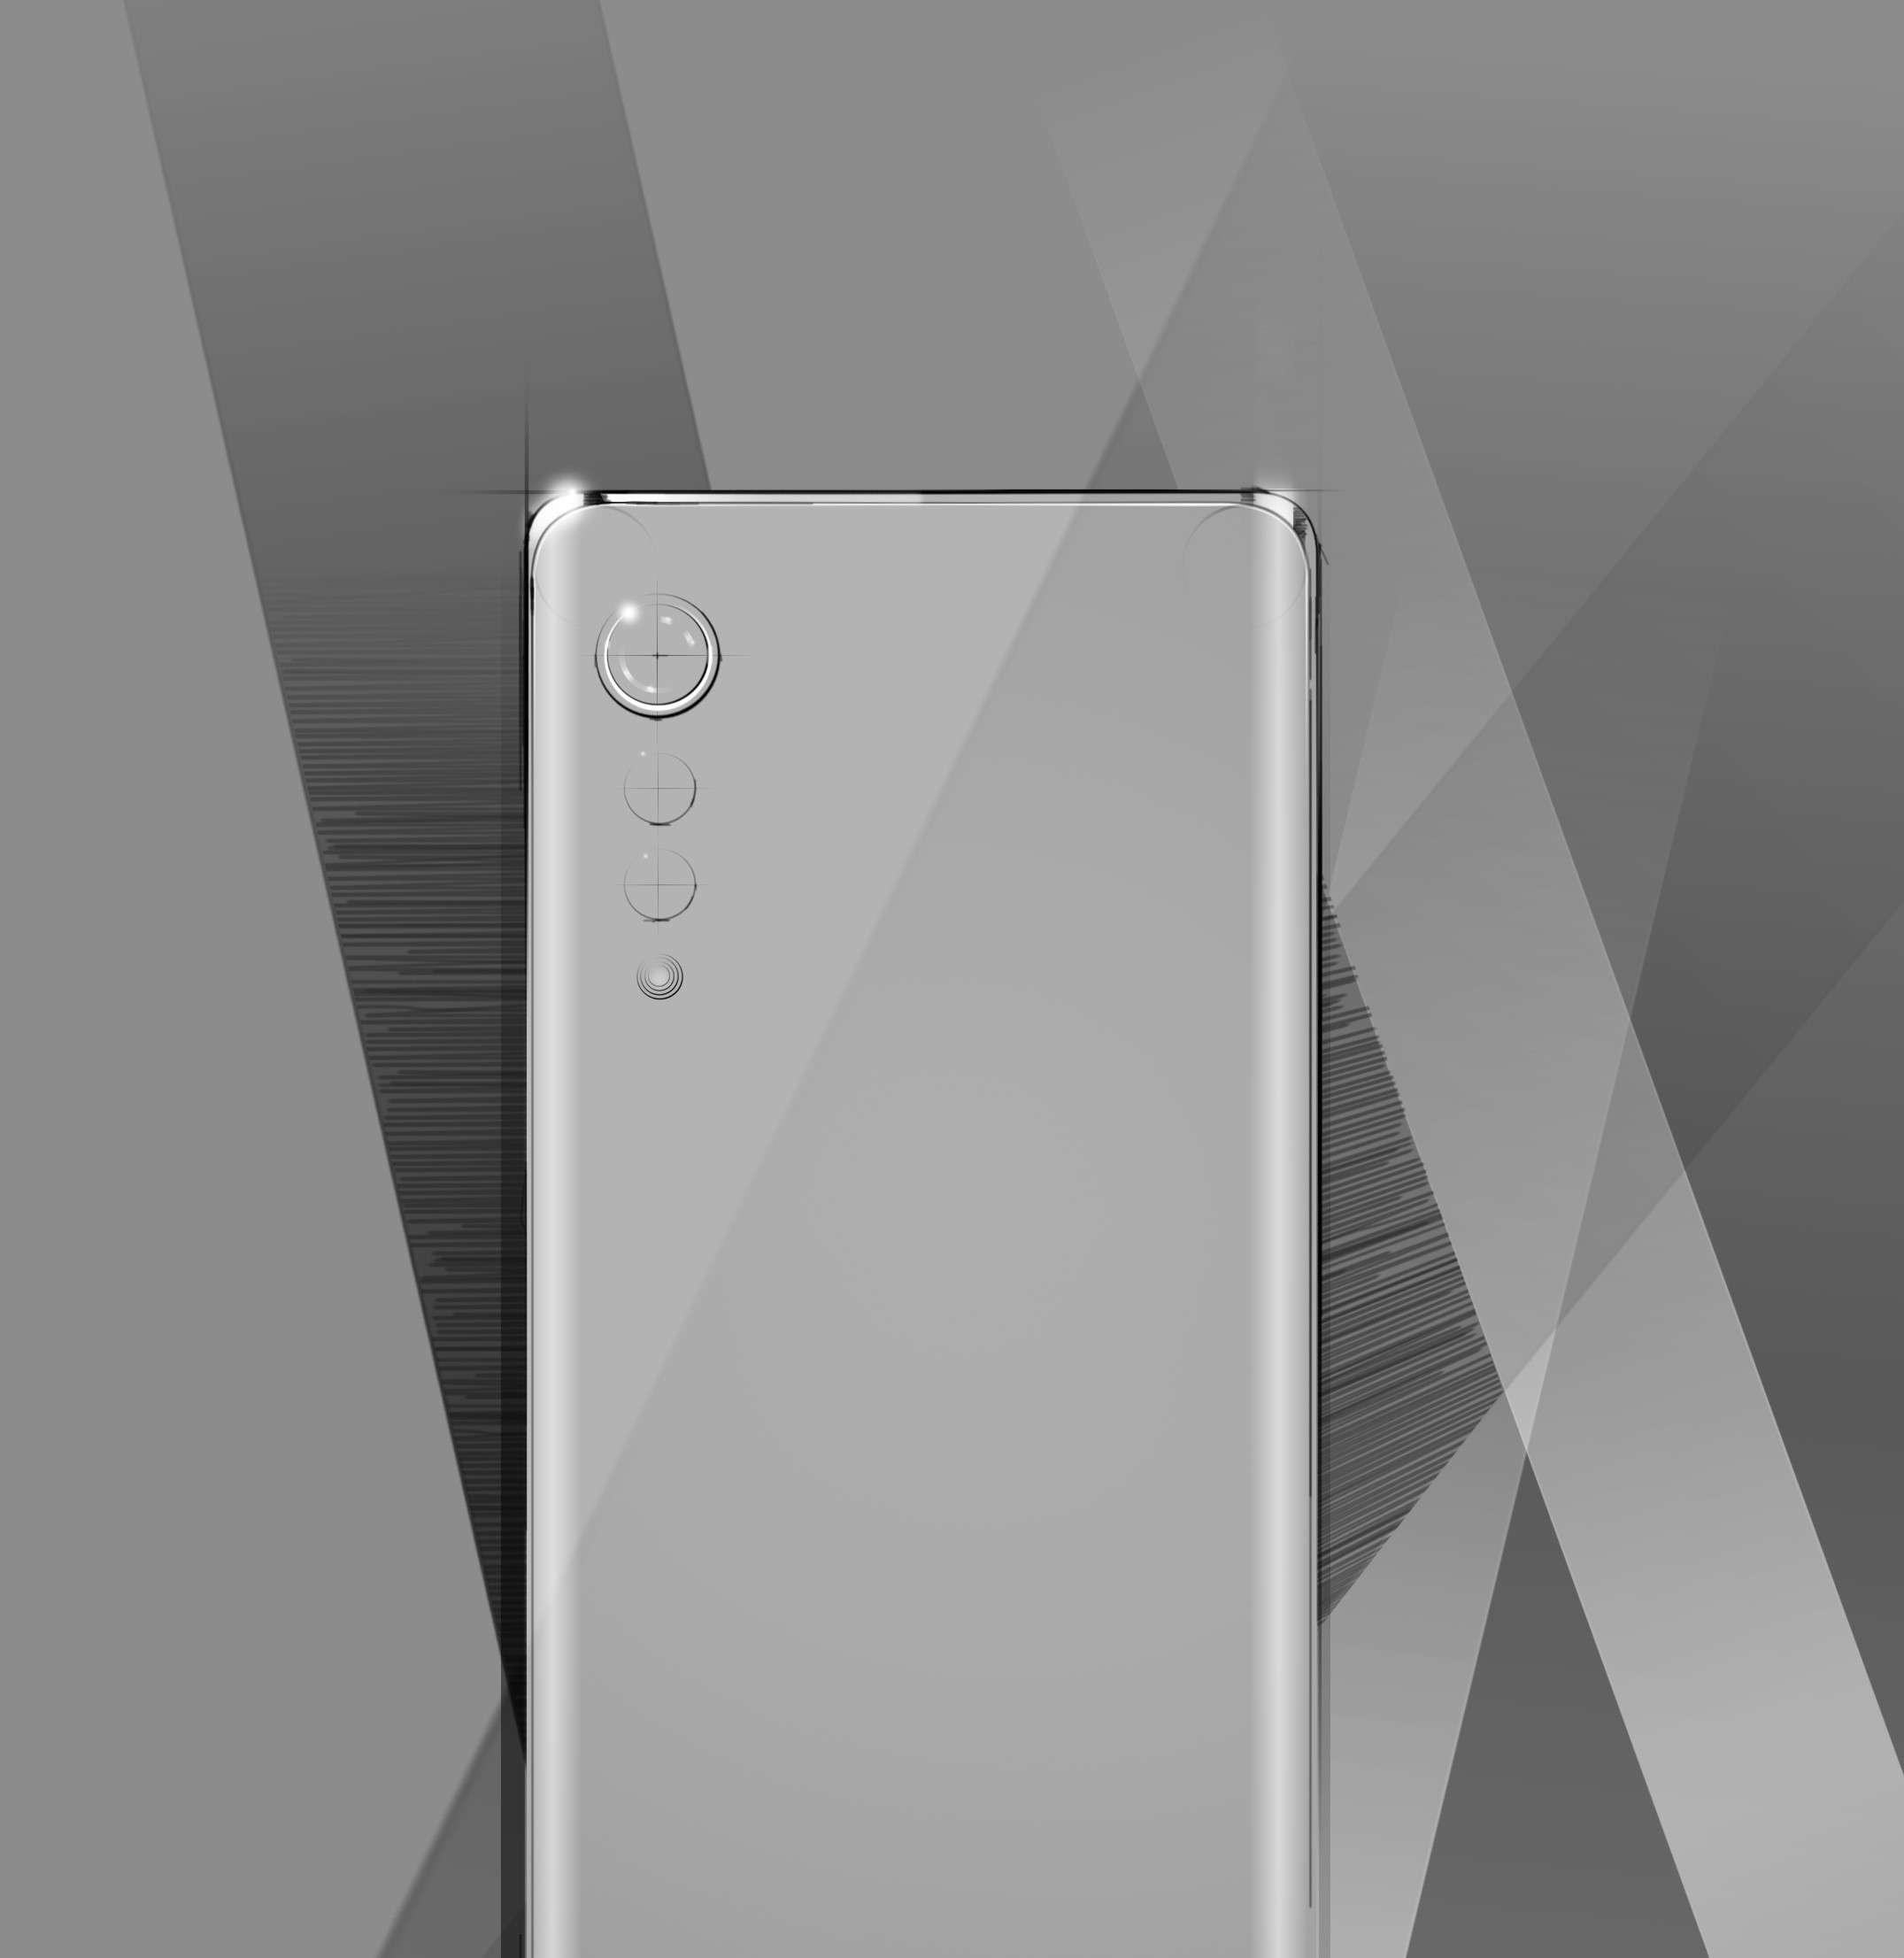 LG new design